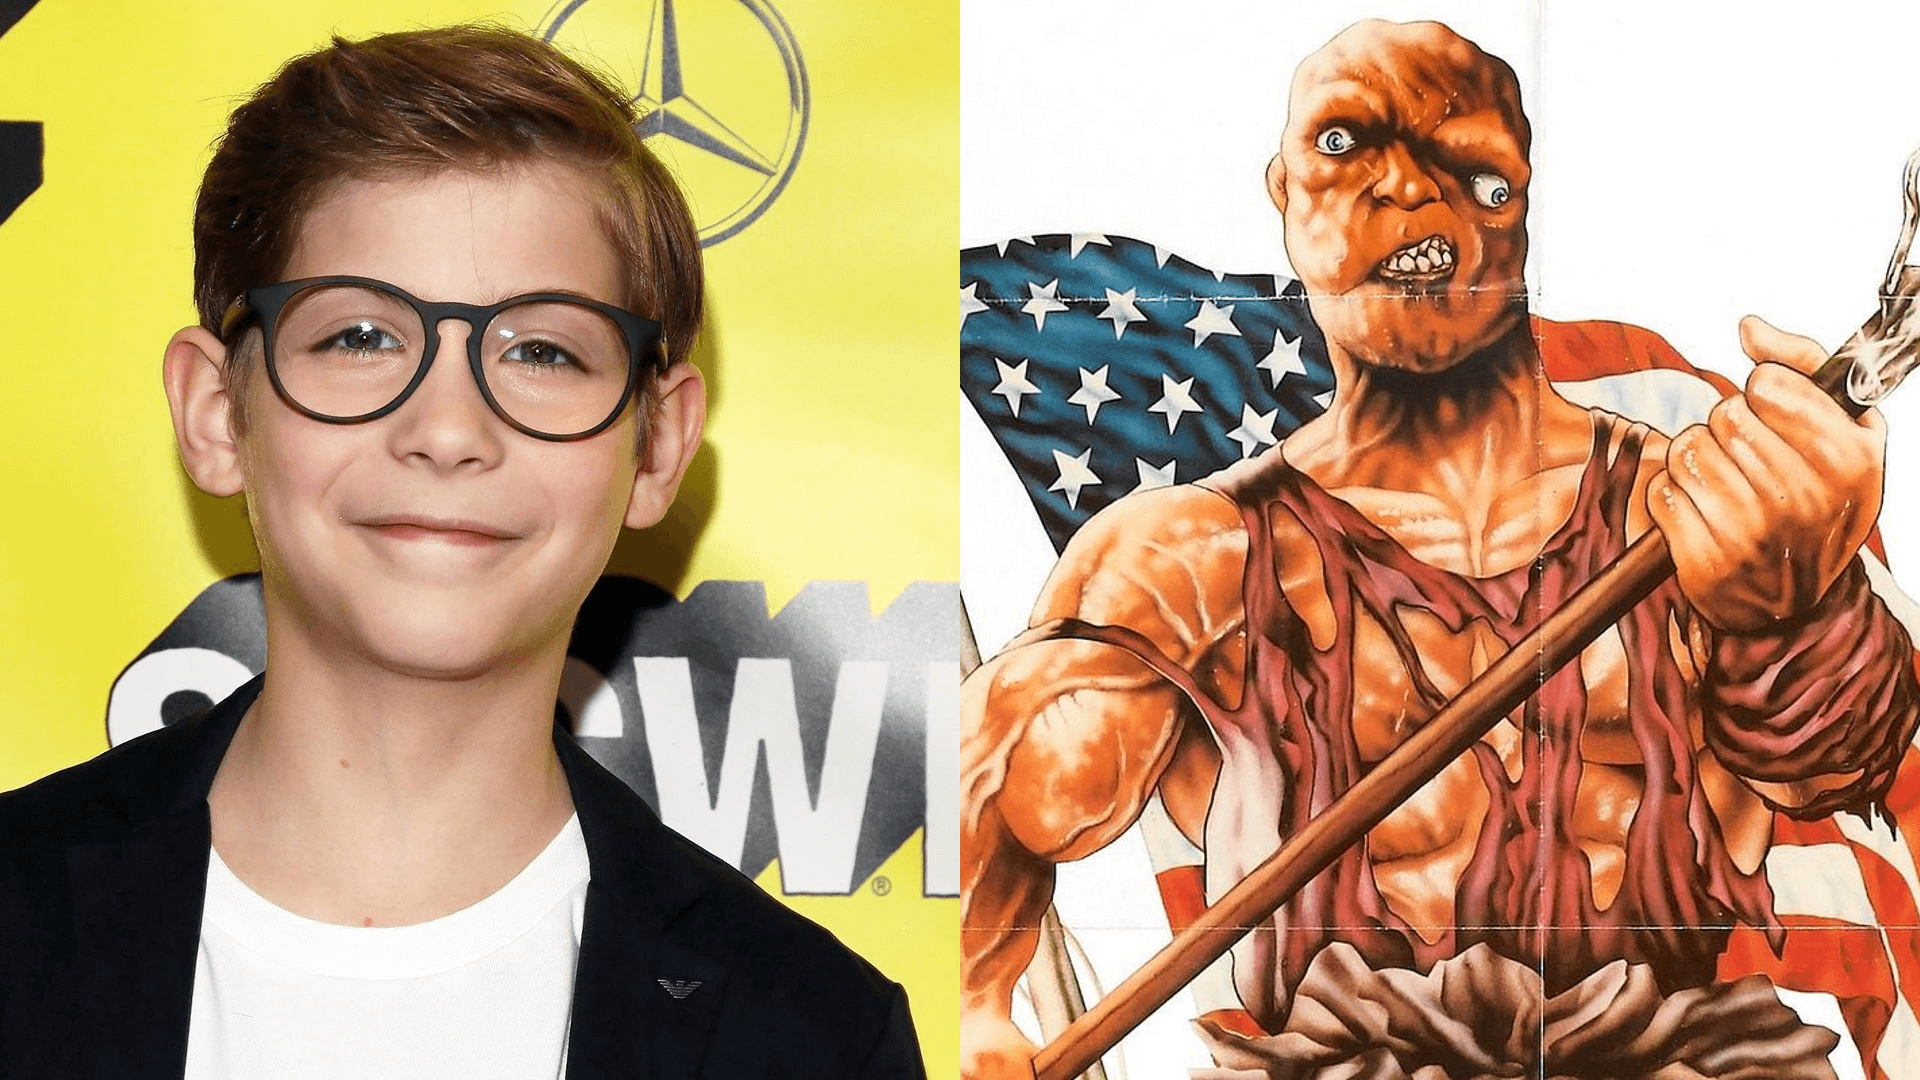 Jacob Tremblay se une al elenco del nuevo remake de Toxic Avenger